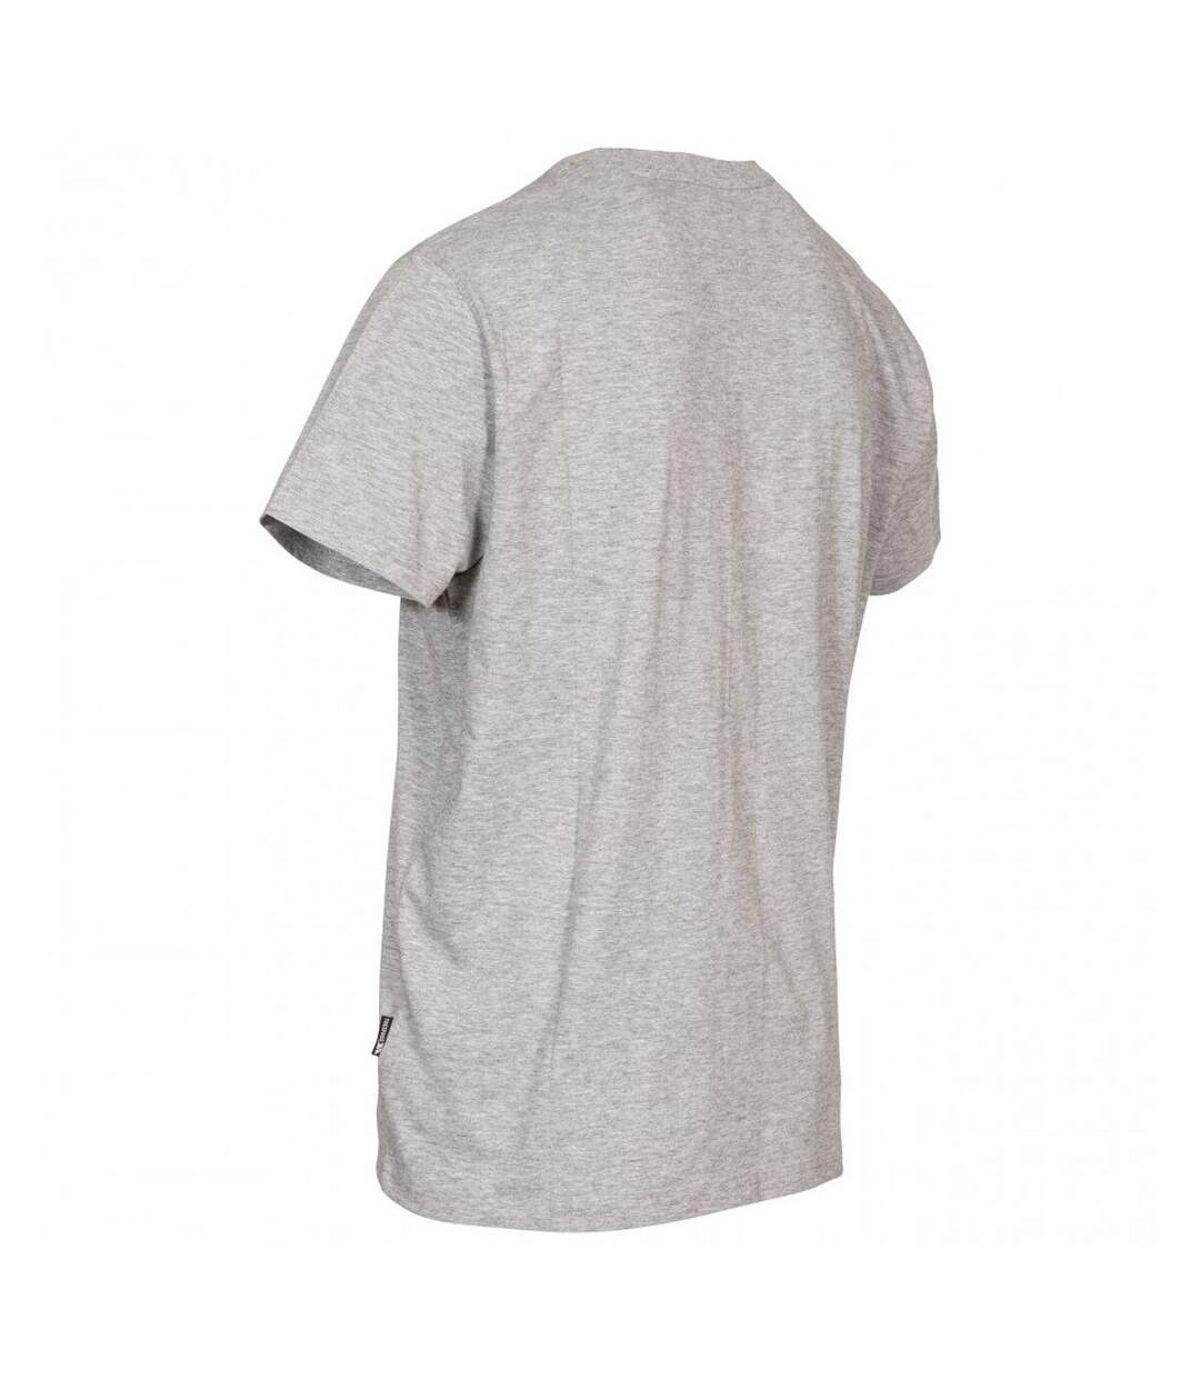 Trespass - T-shirt COURSE - Homme (Gris chiné) - UTTP4295